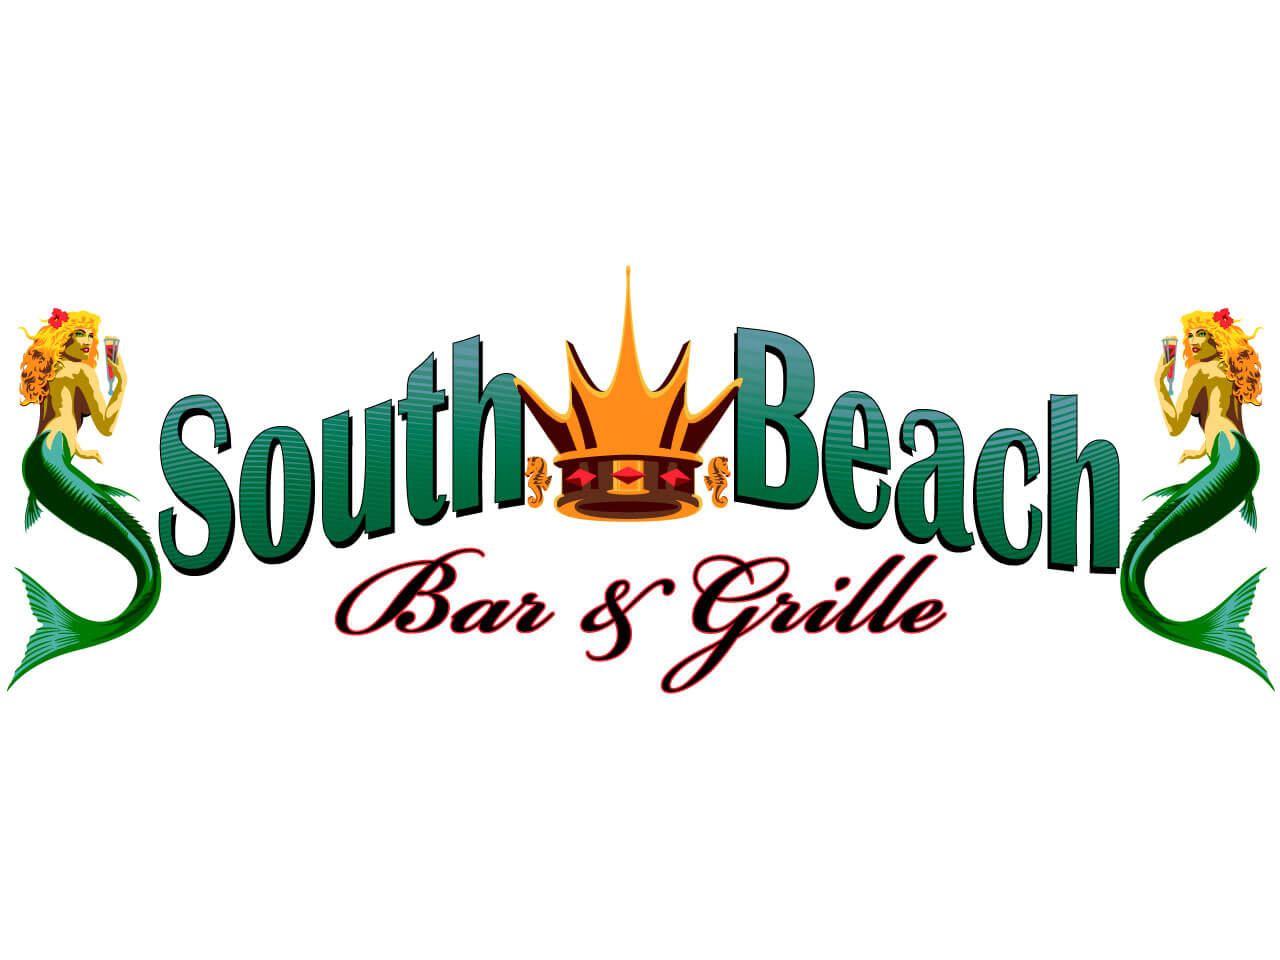 South Beach Bar and Grille logo treatment - titlebar